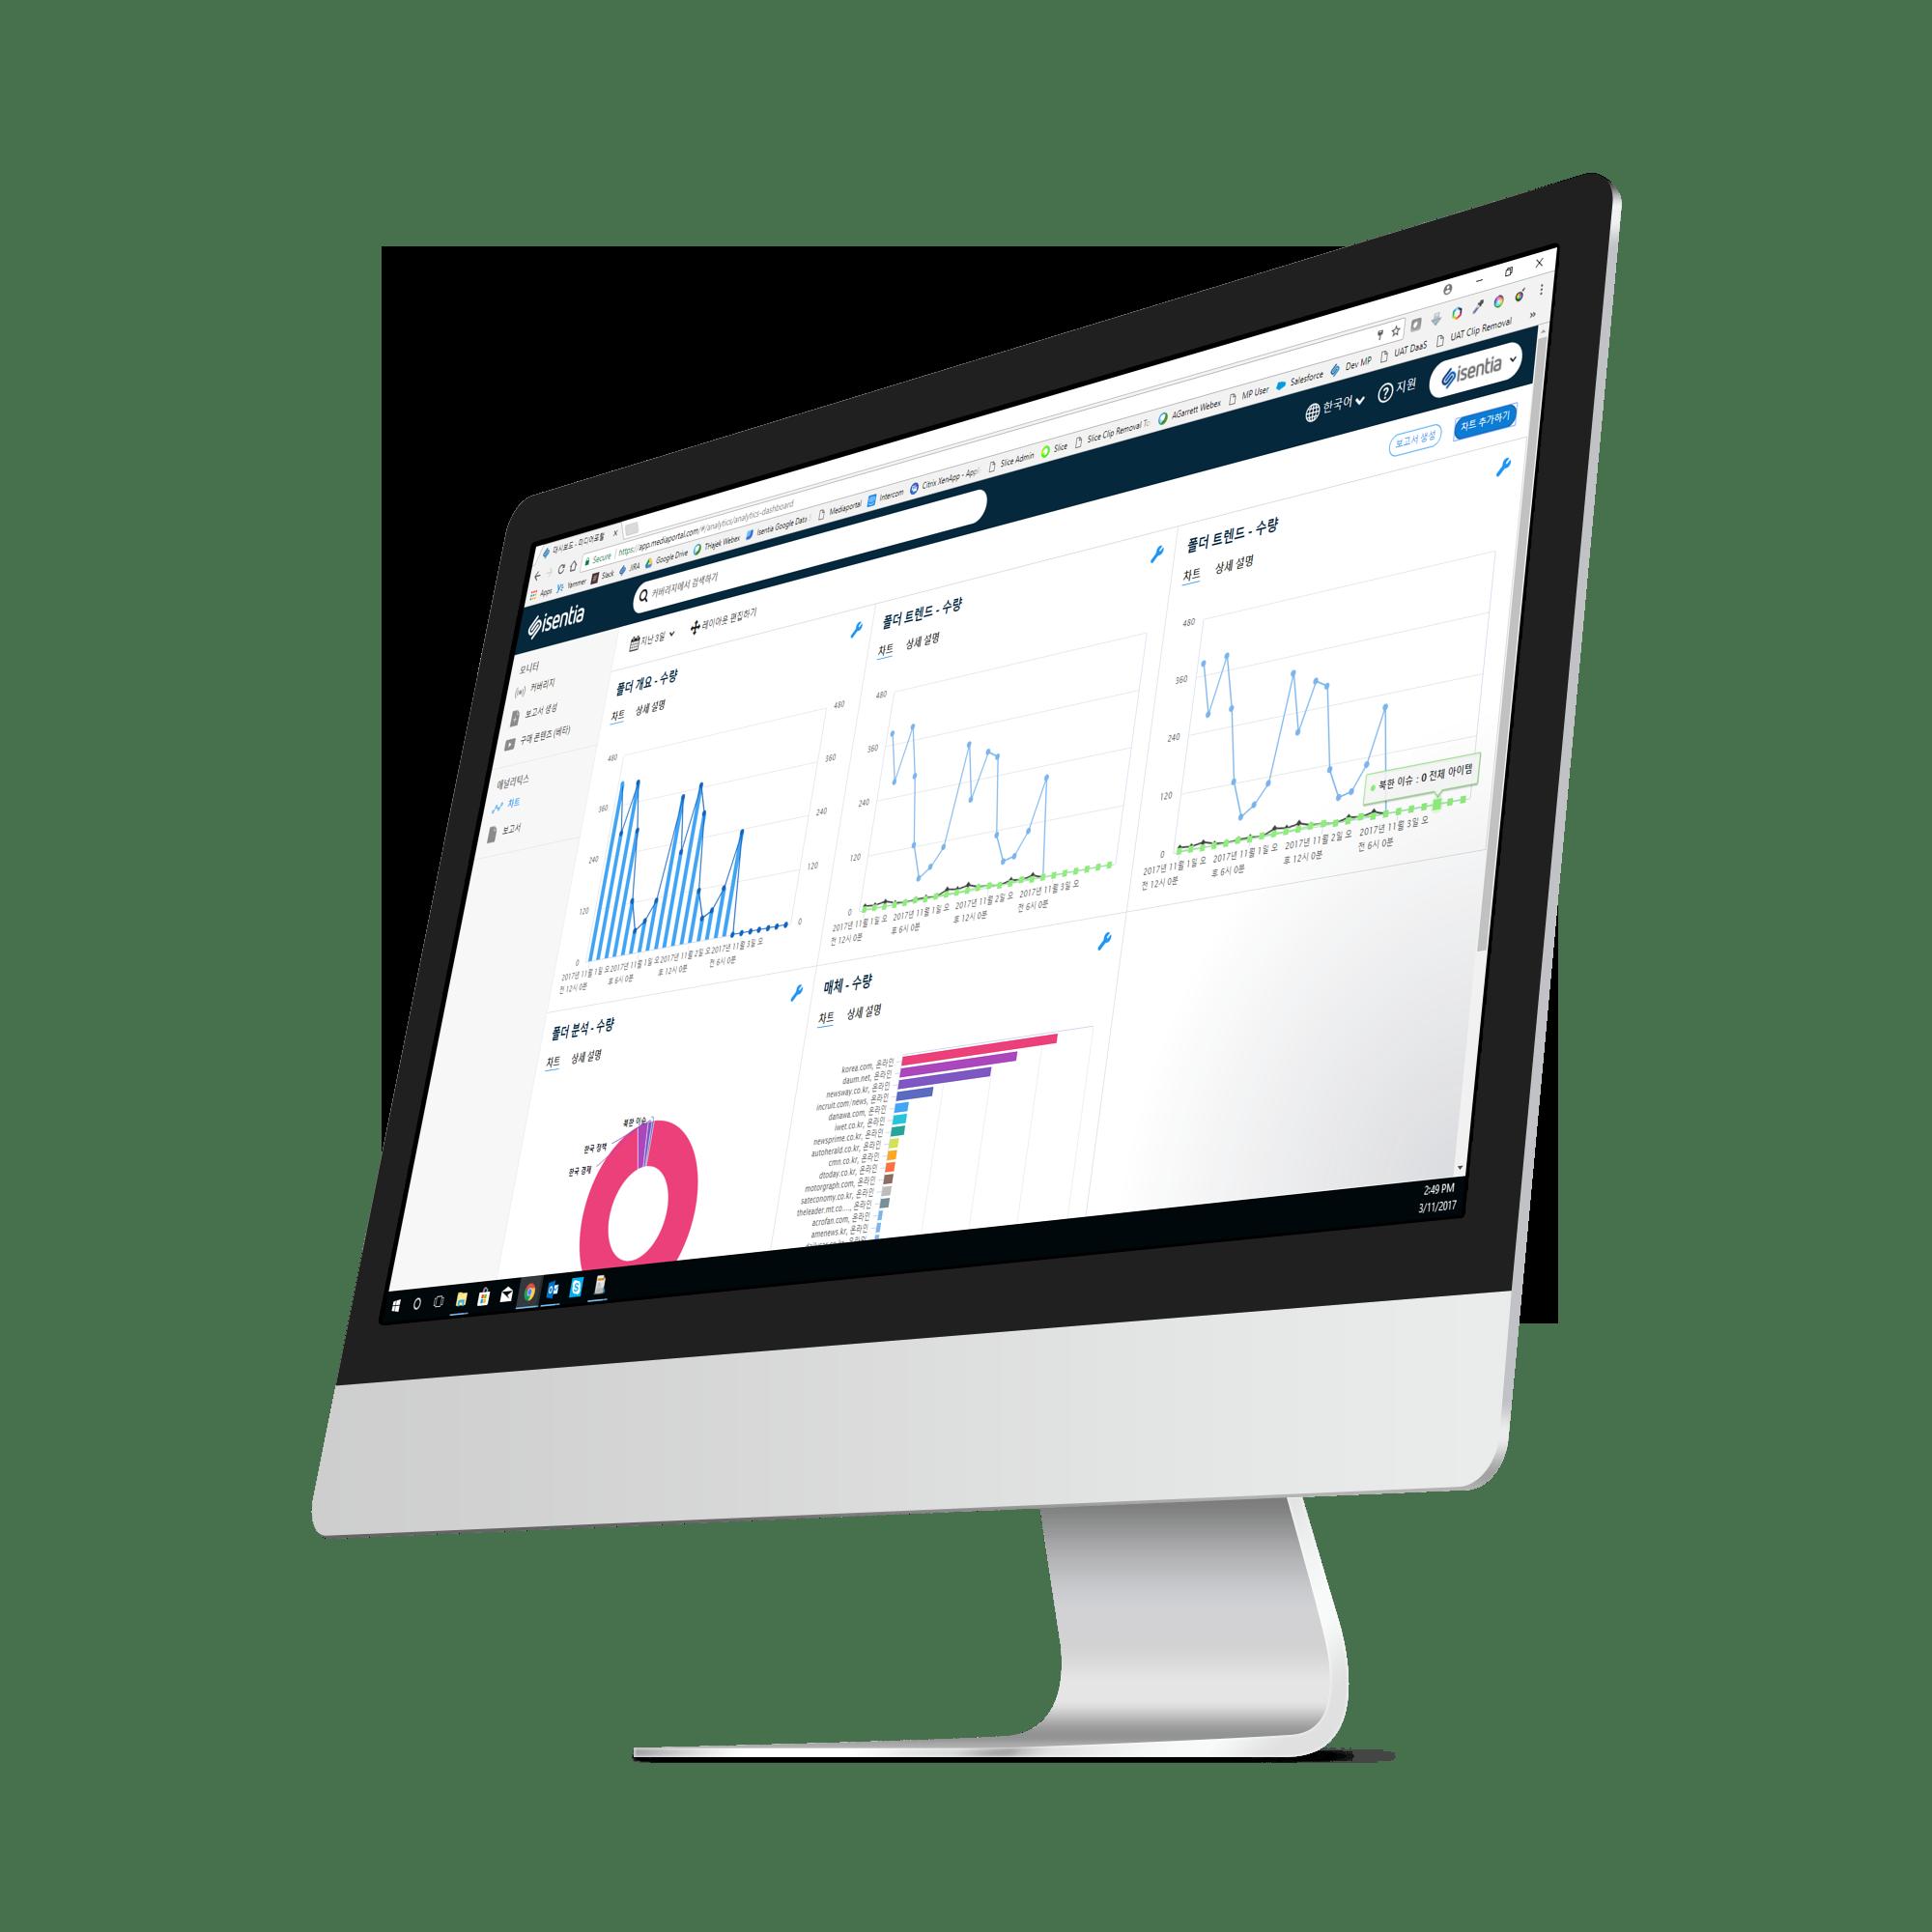 Isentia Mediaportal Demo - Mediaportal Analytics with Korean UI